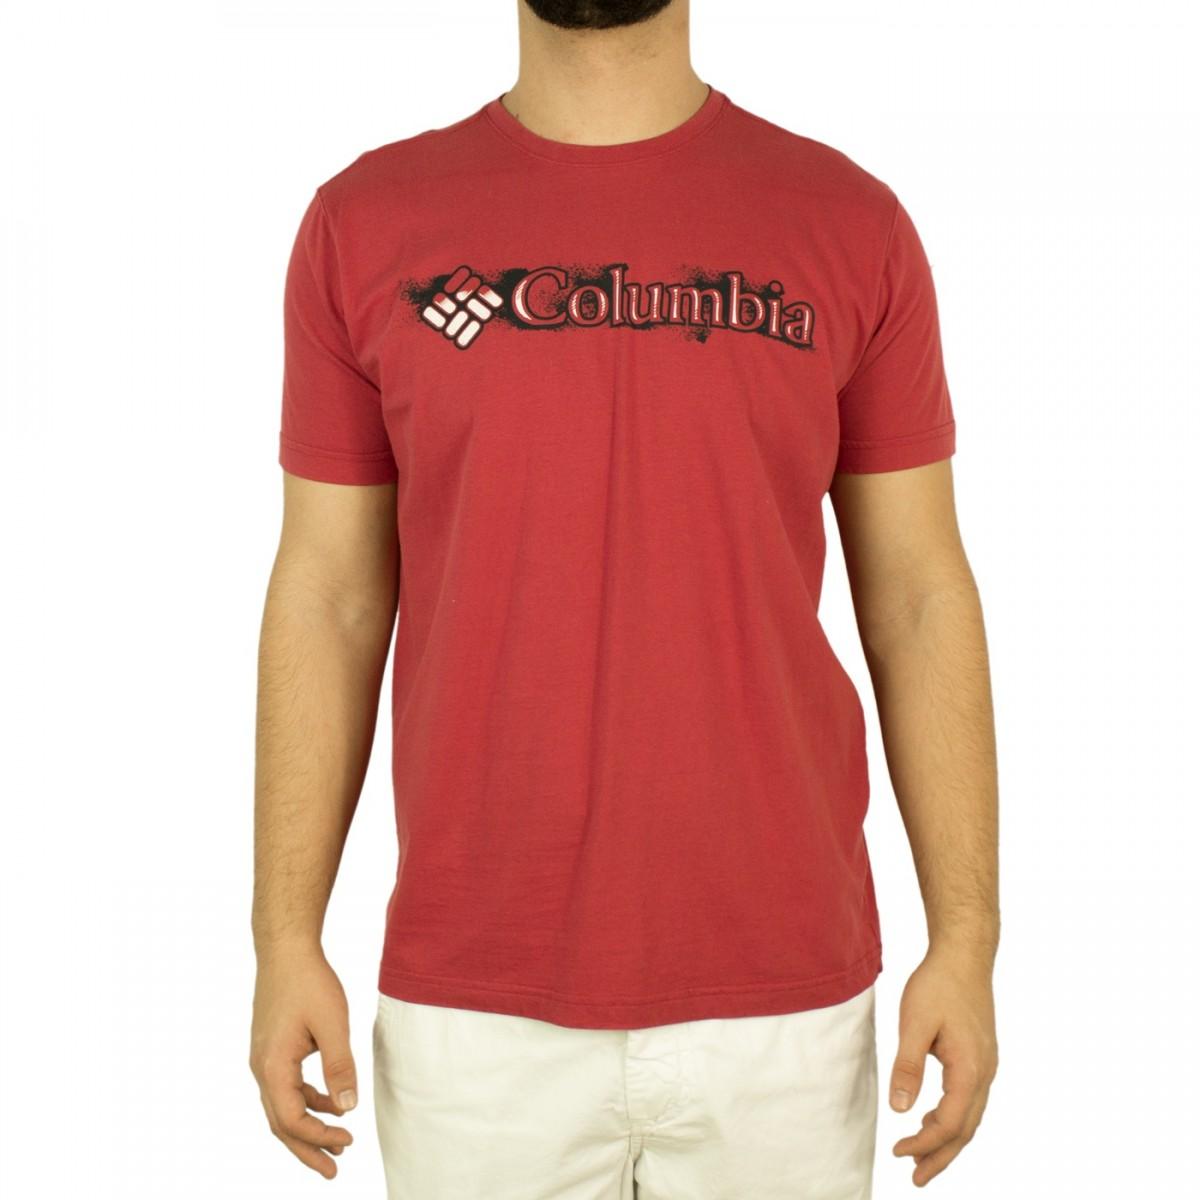 b3eb5c44e61 Bizz Store - Camiseta Masculina Columbia Sea Spray Vermelha